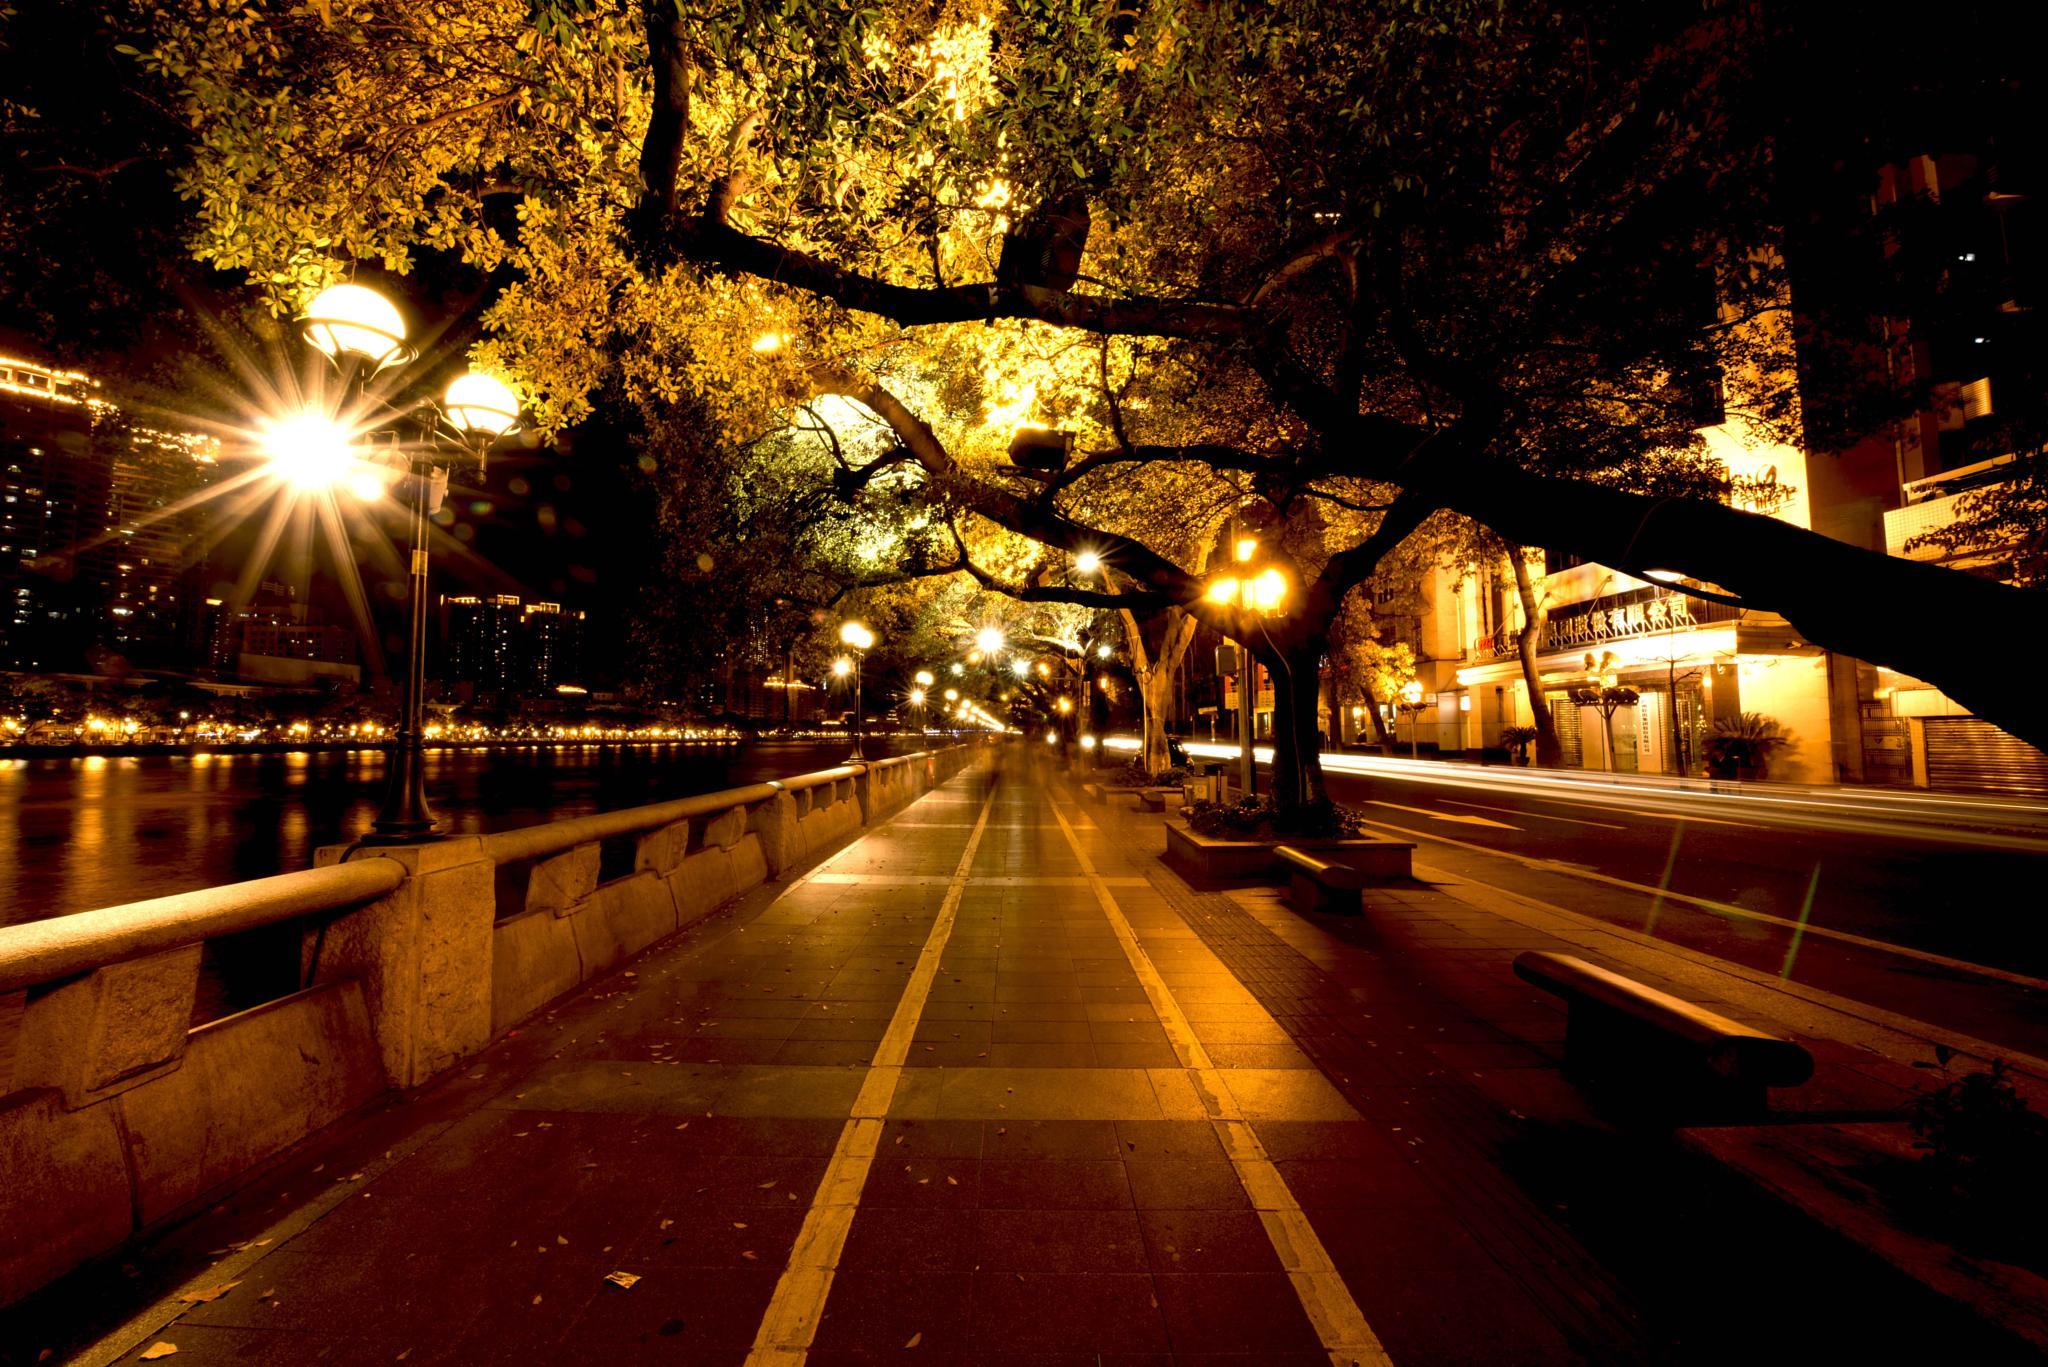 Quite Street by eddylowck